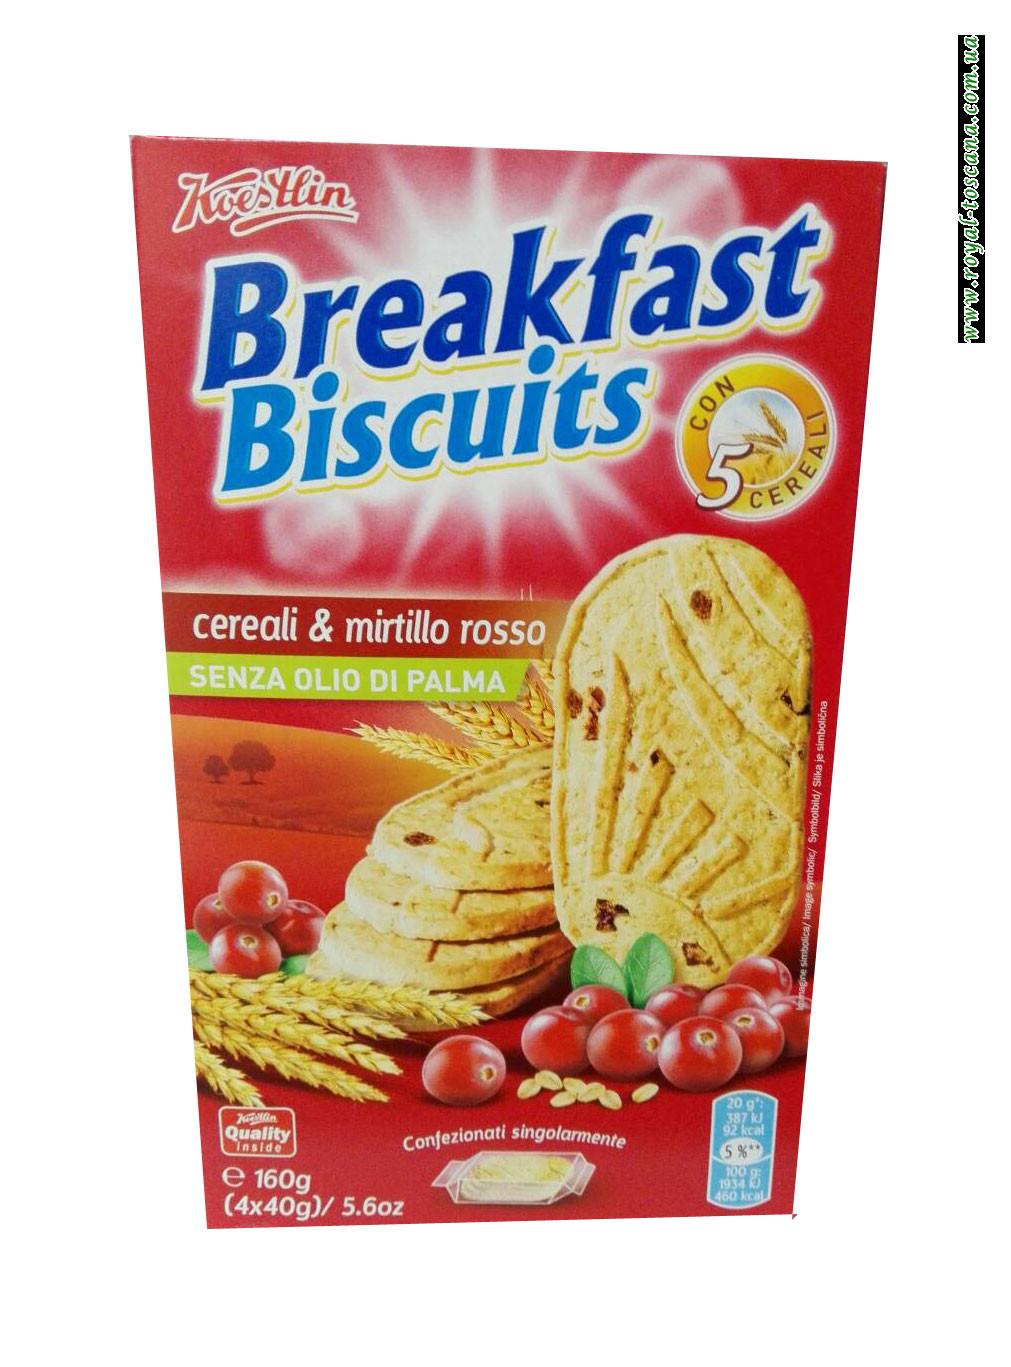 Печенье Breakfast Biscuits Cereali & Mirtillo Rosso